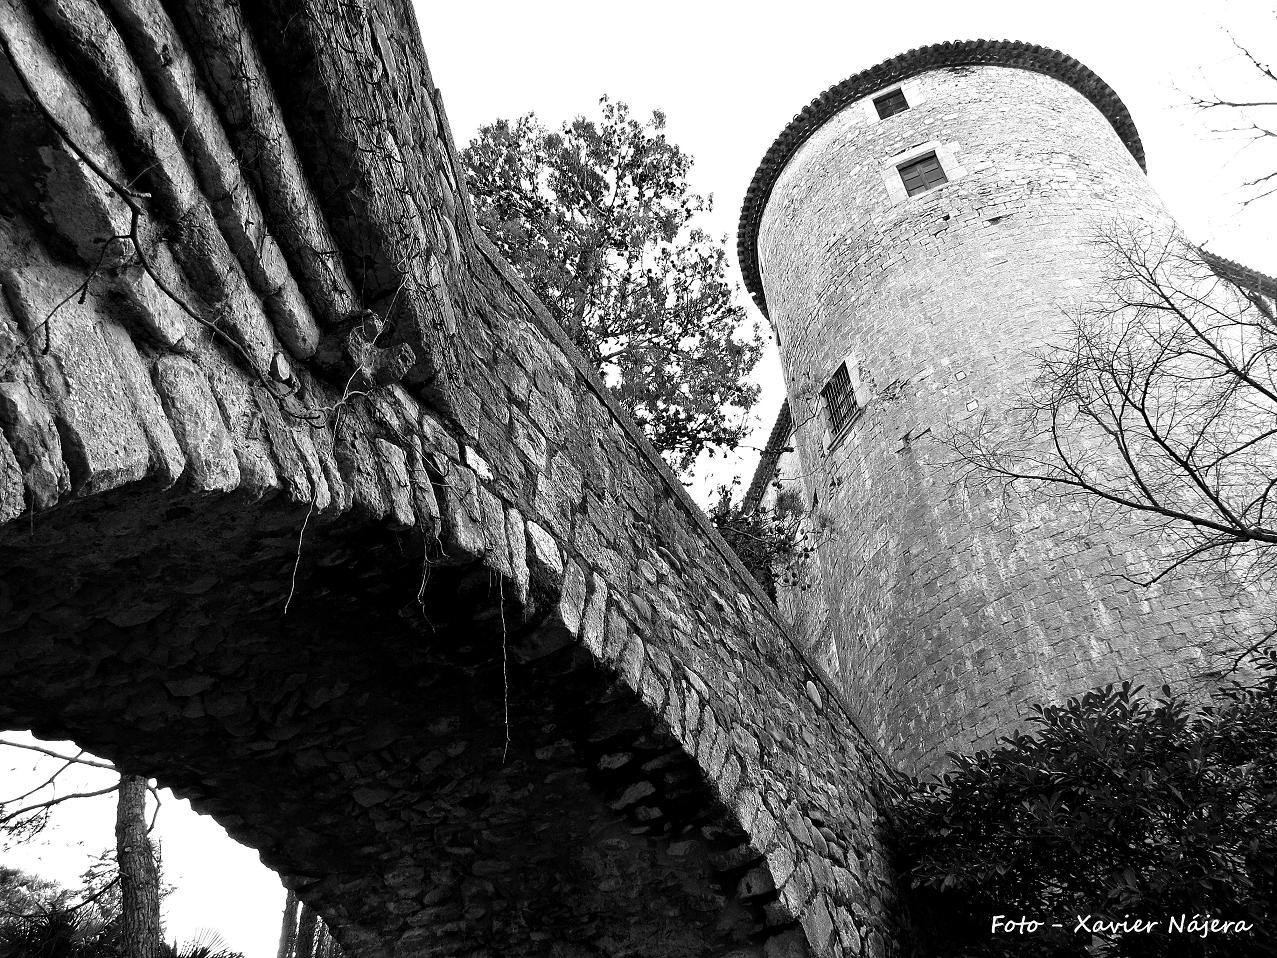 De camino a la torre